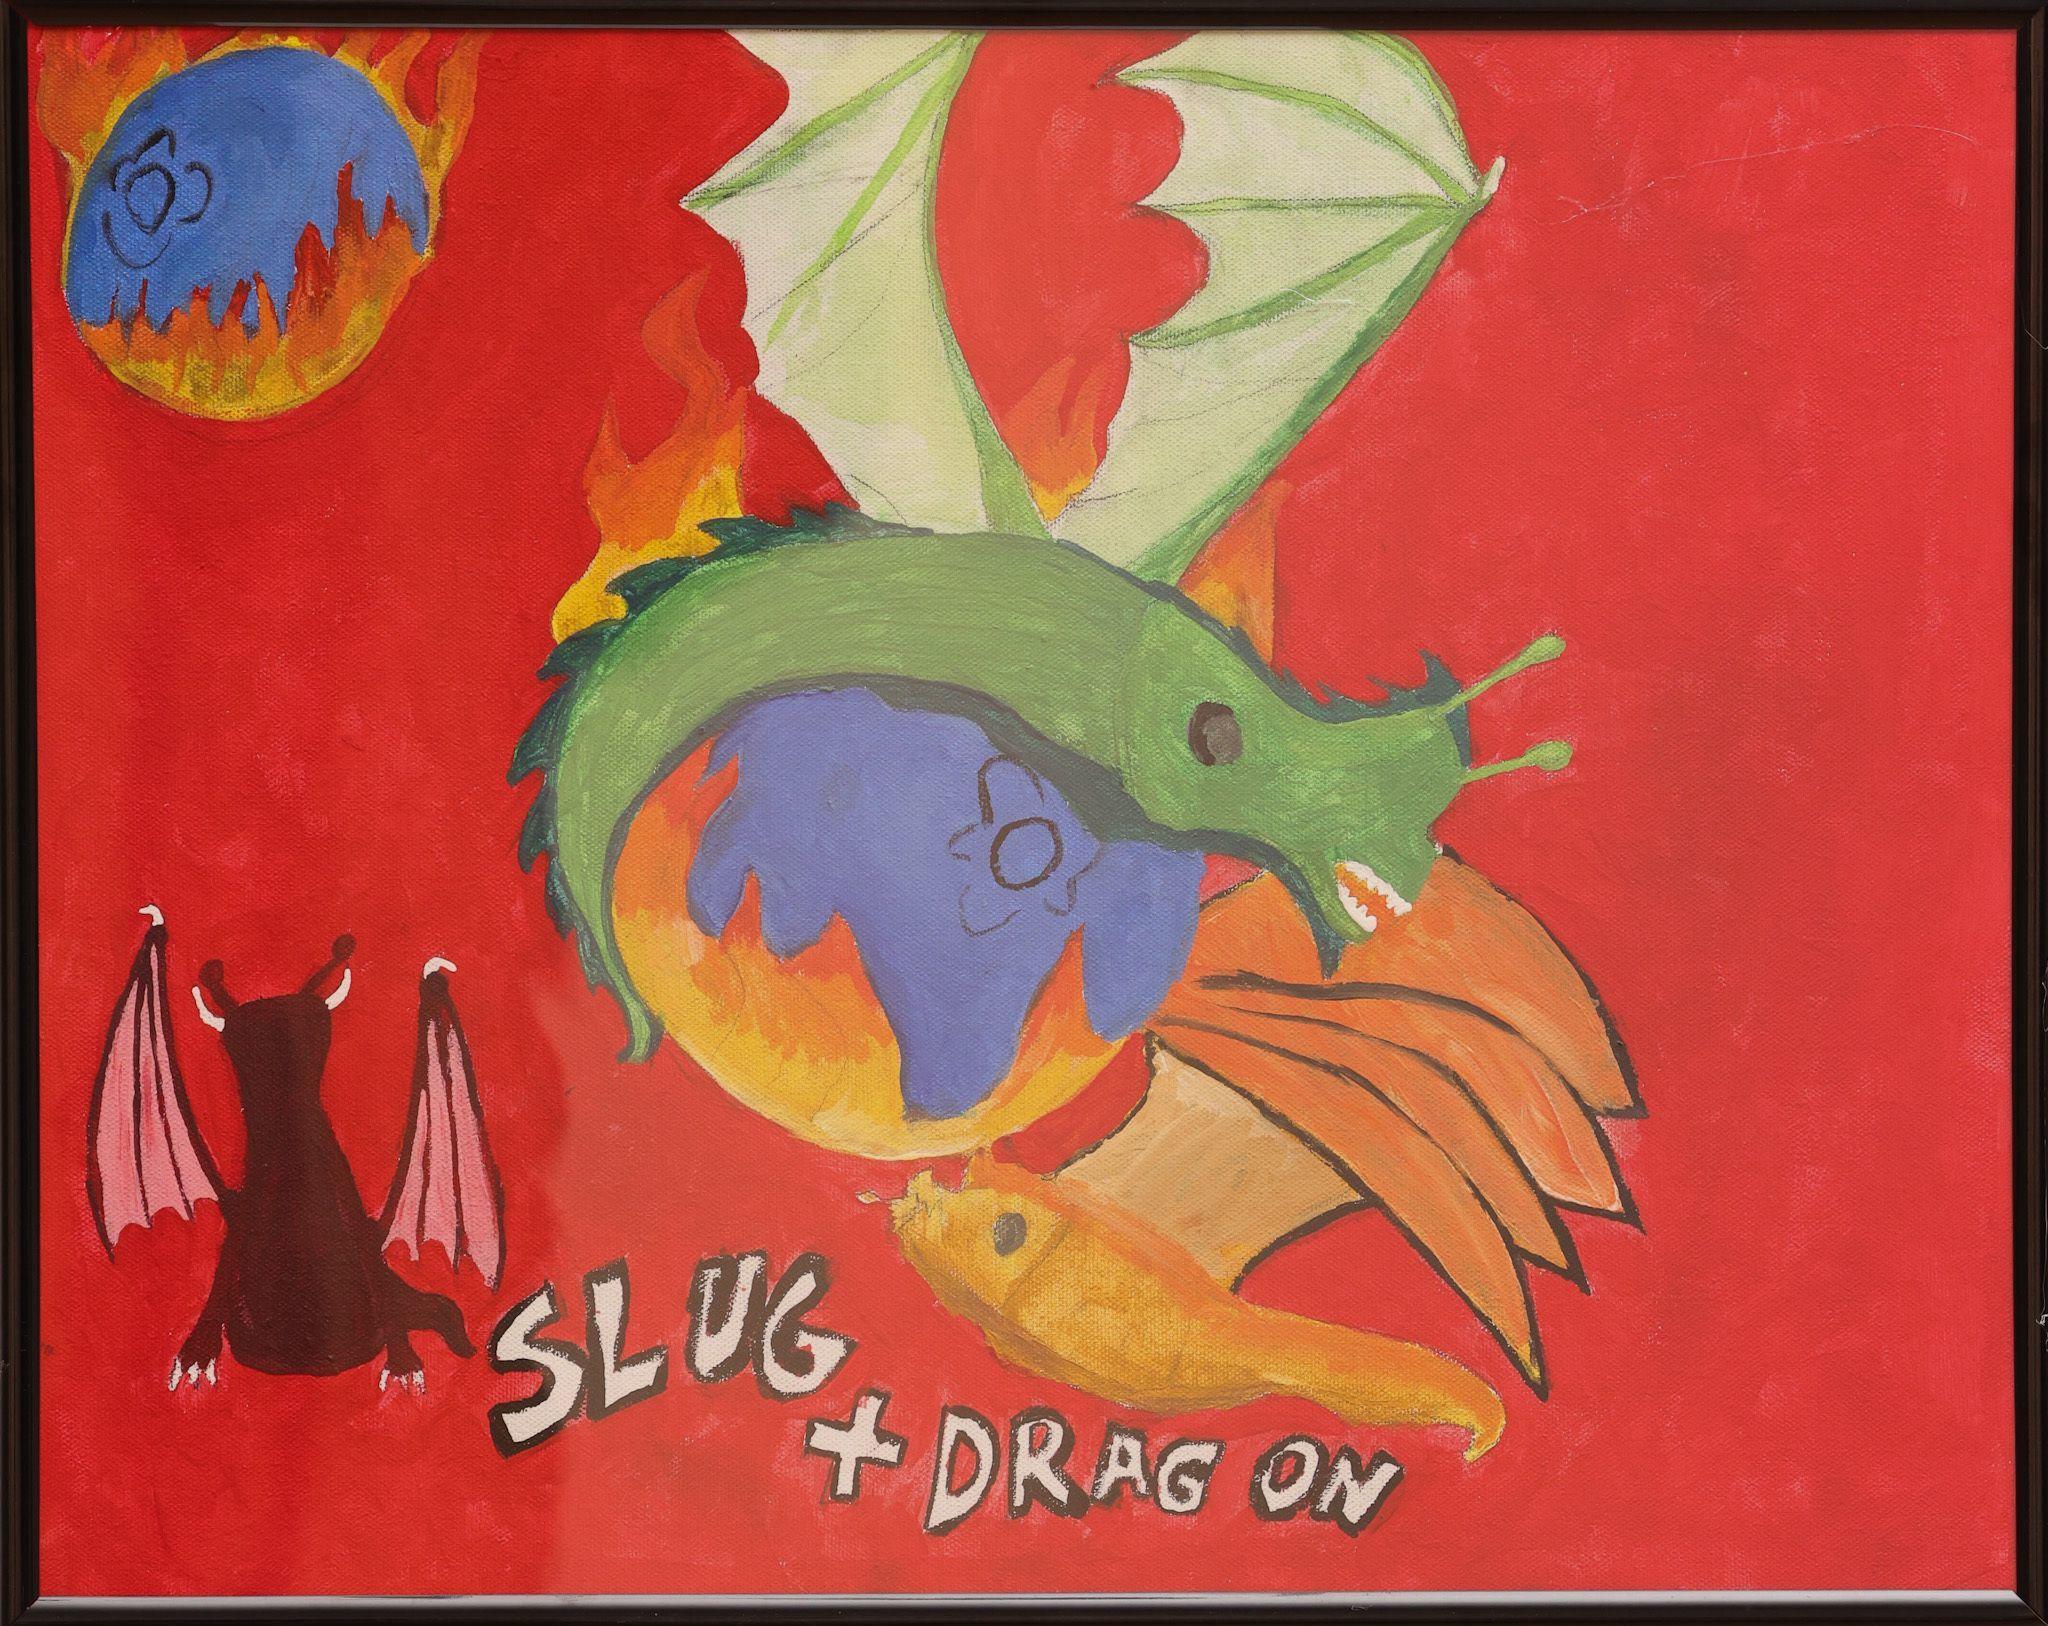 """Flaming Blueberries and Slug Dragons"" - Orsen Mike"